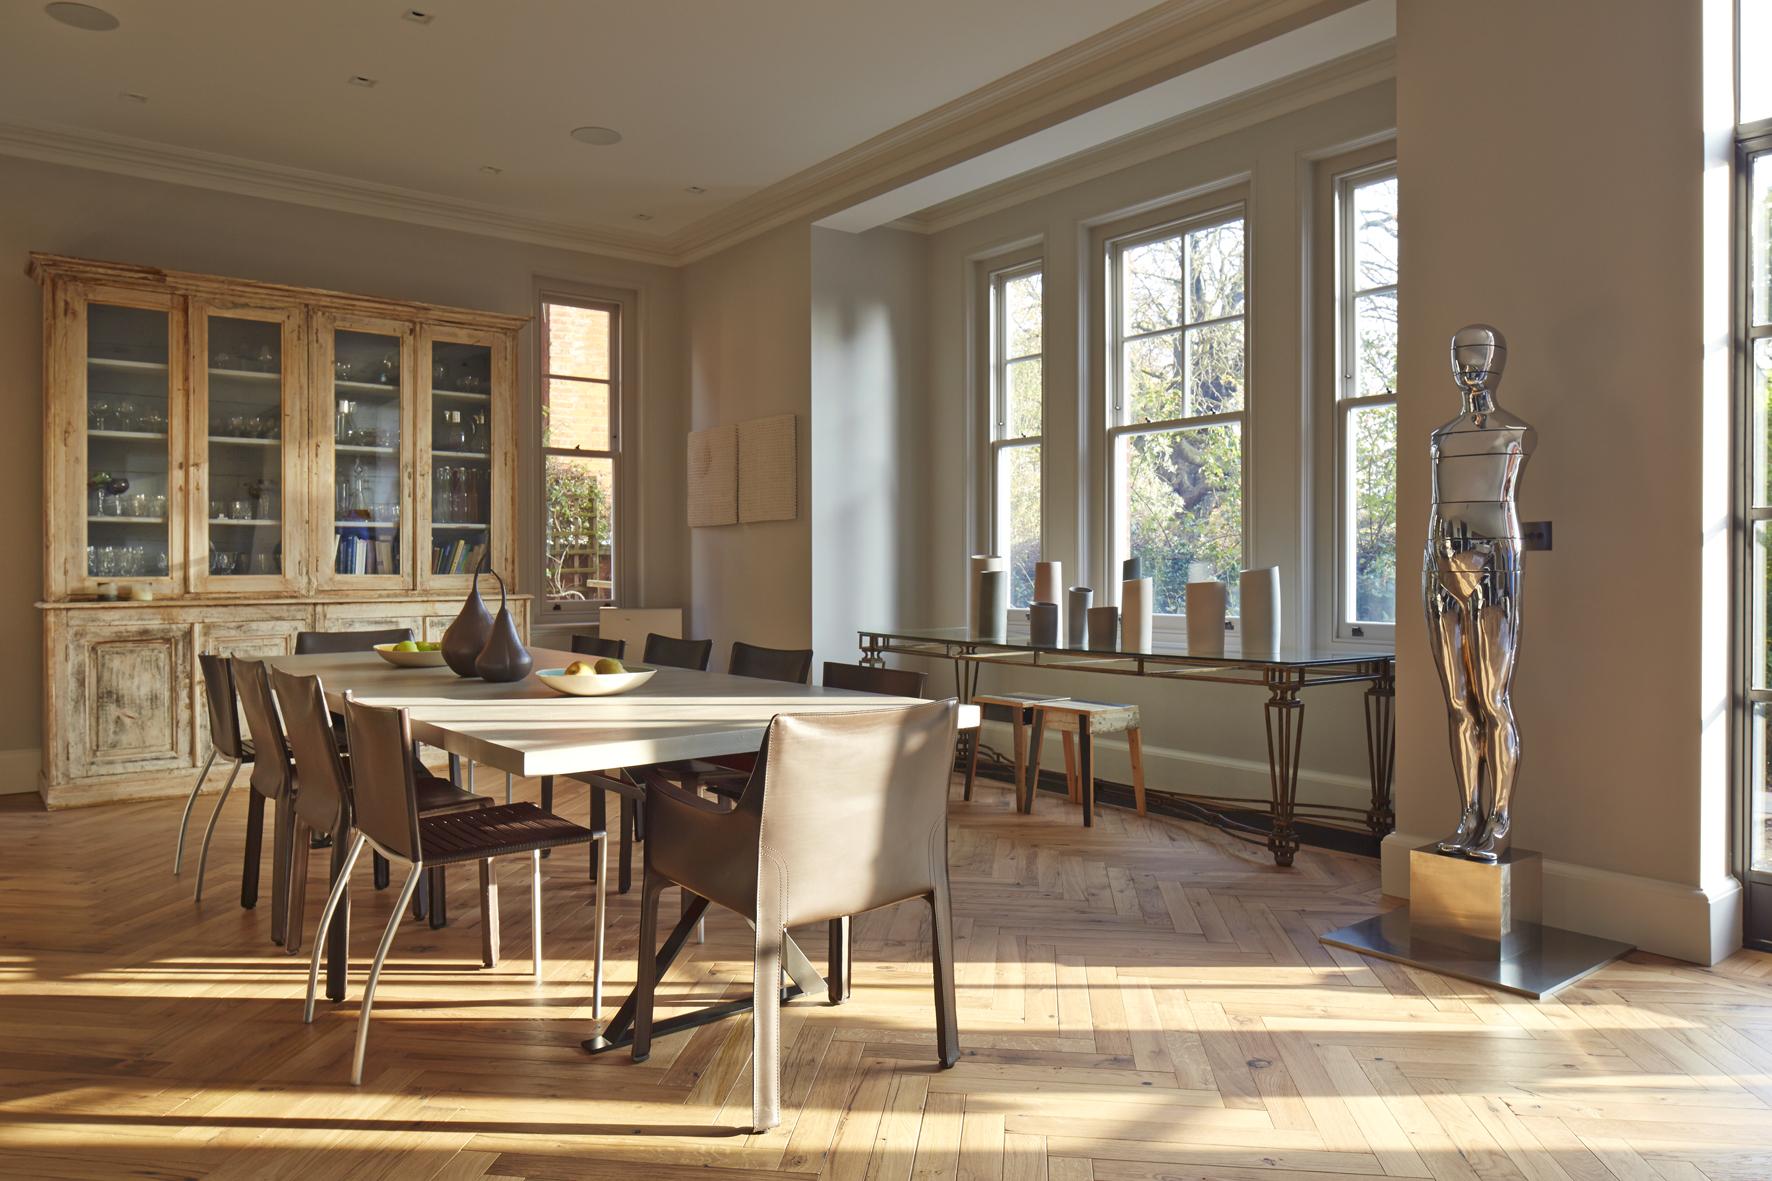 Hampstead dining room interior